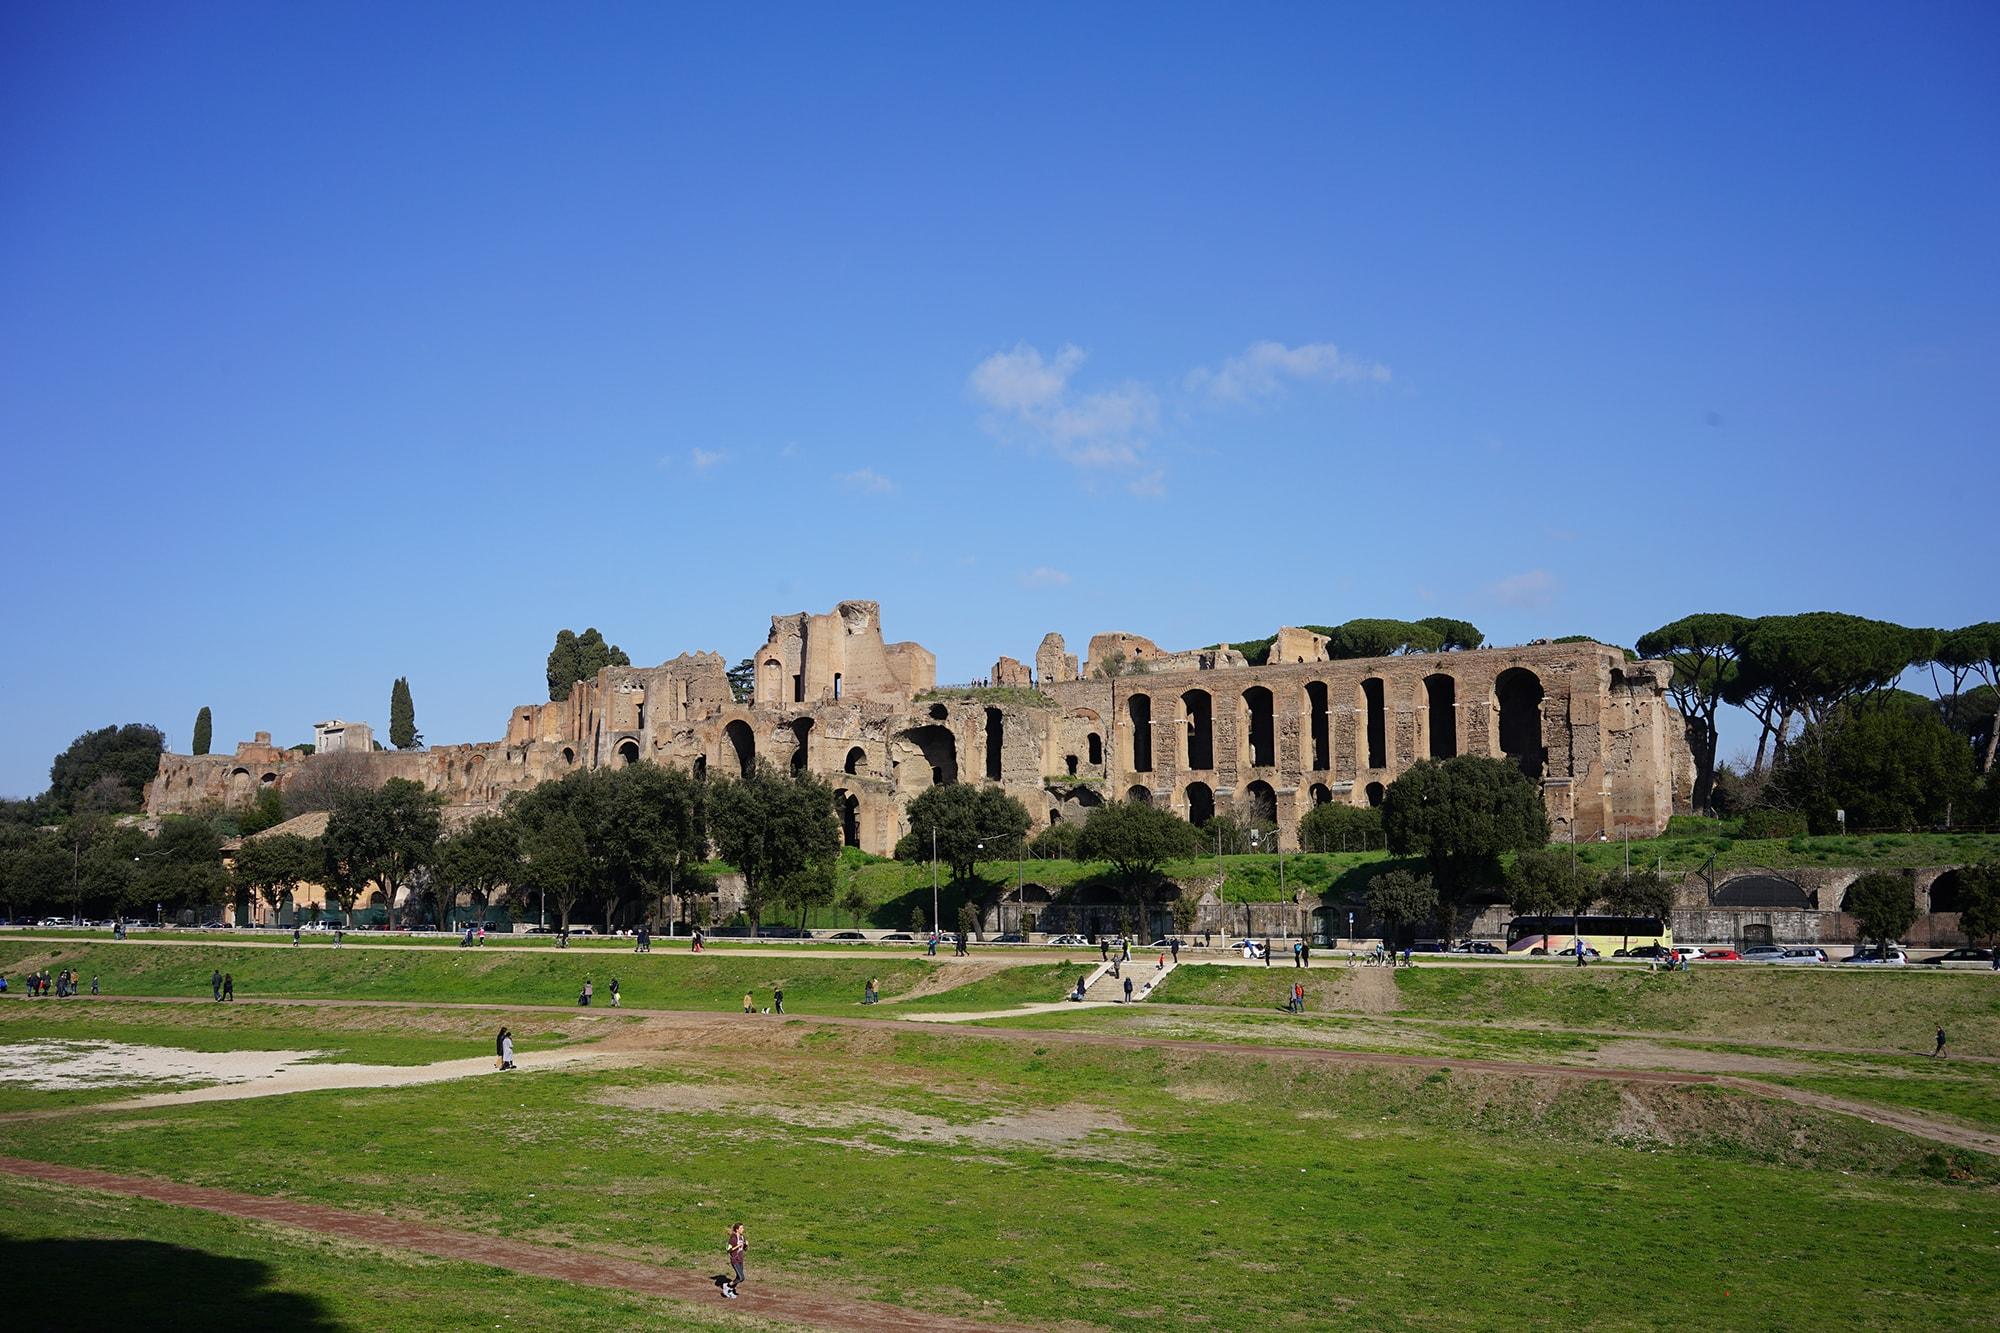 Palatino Circo Massimo